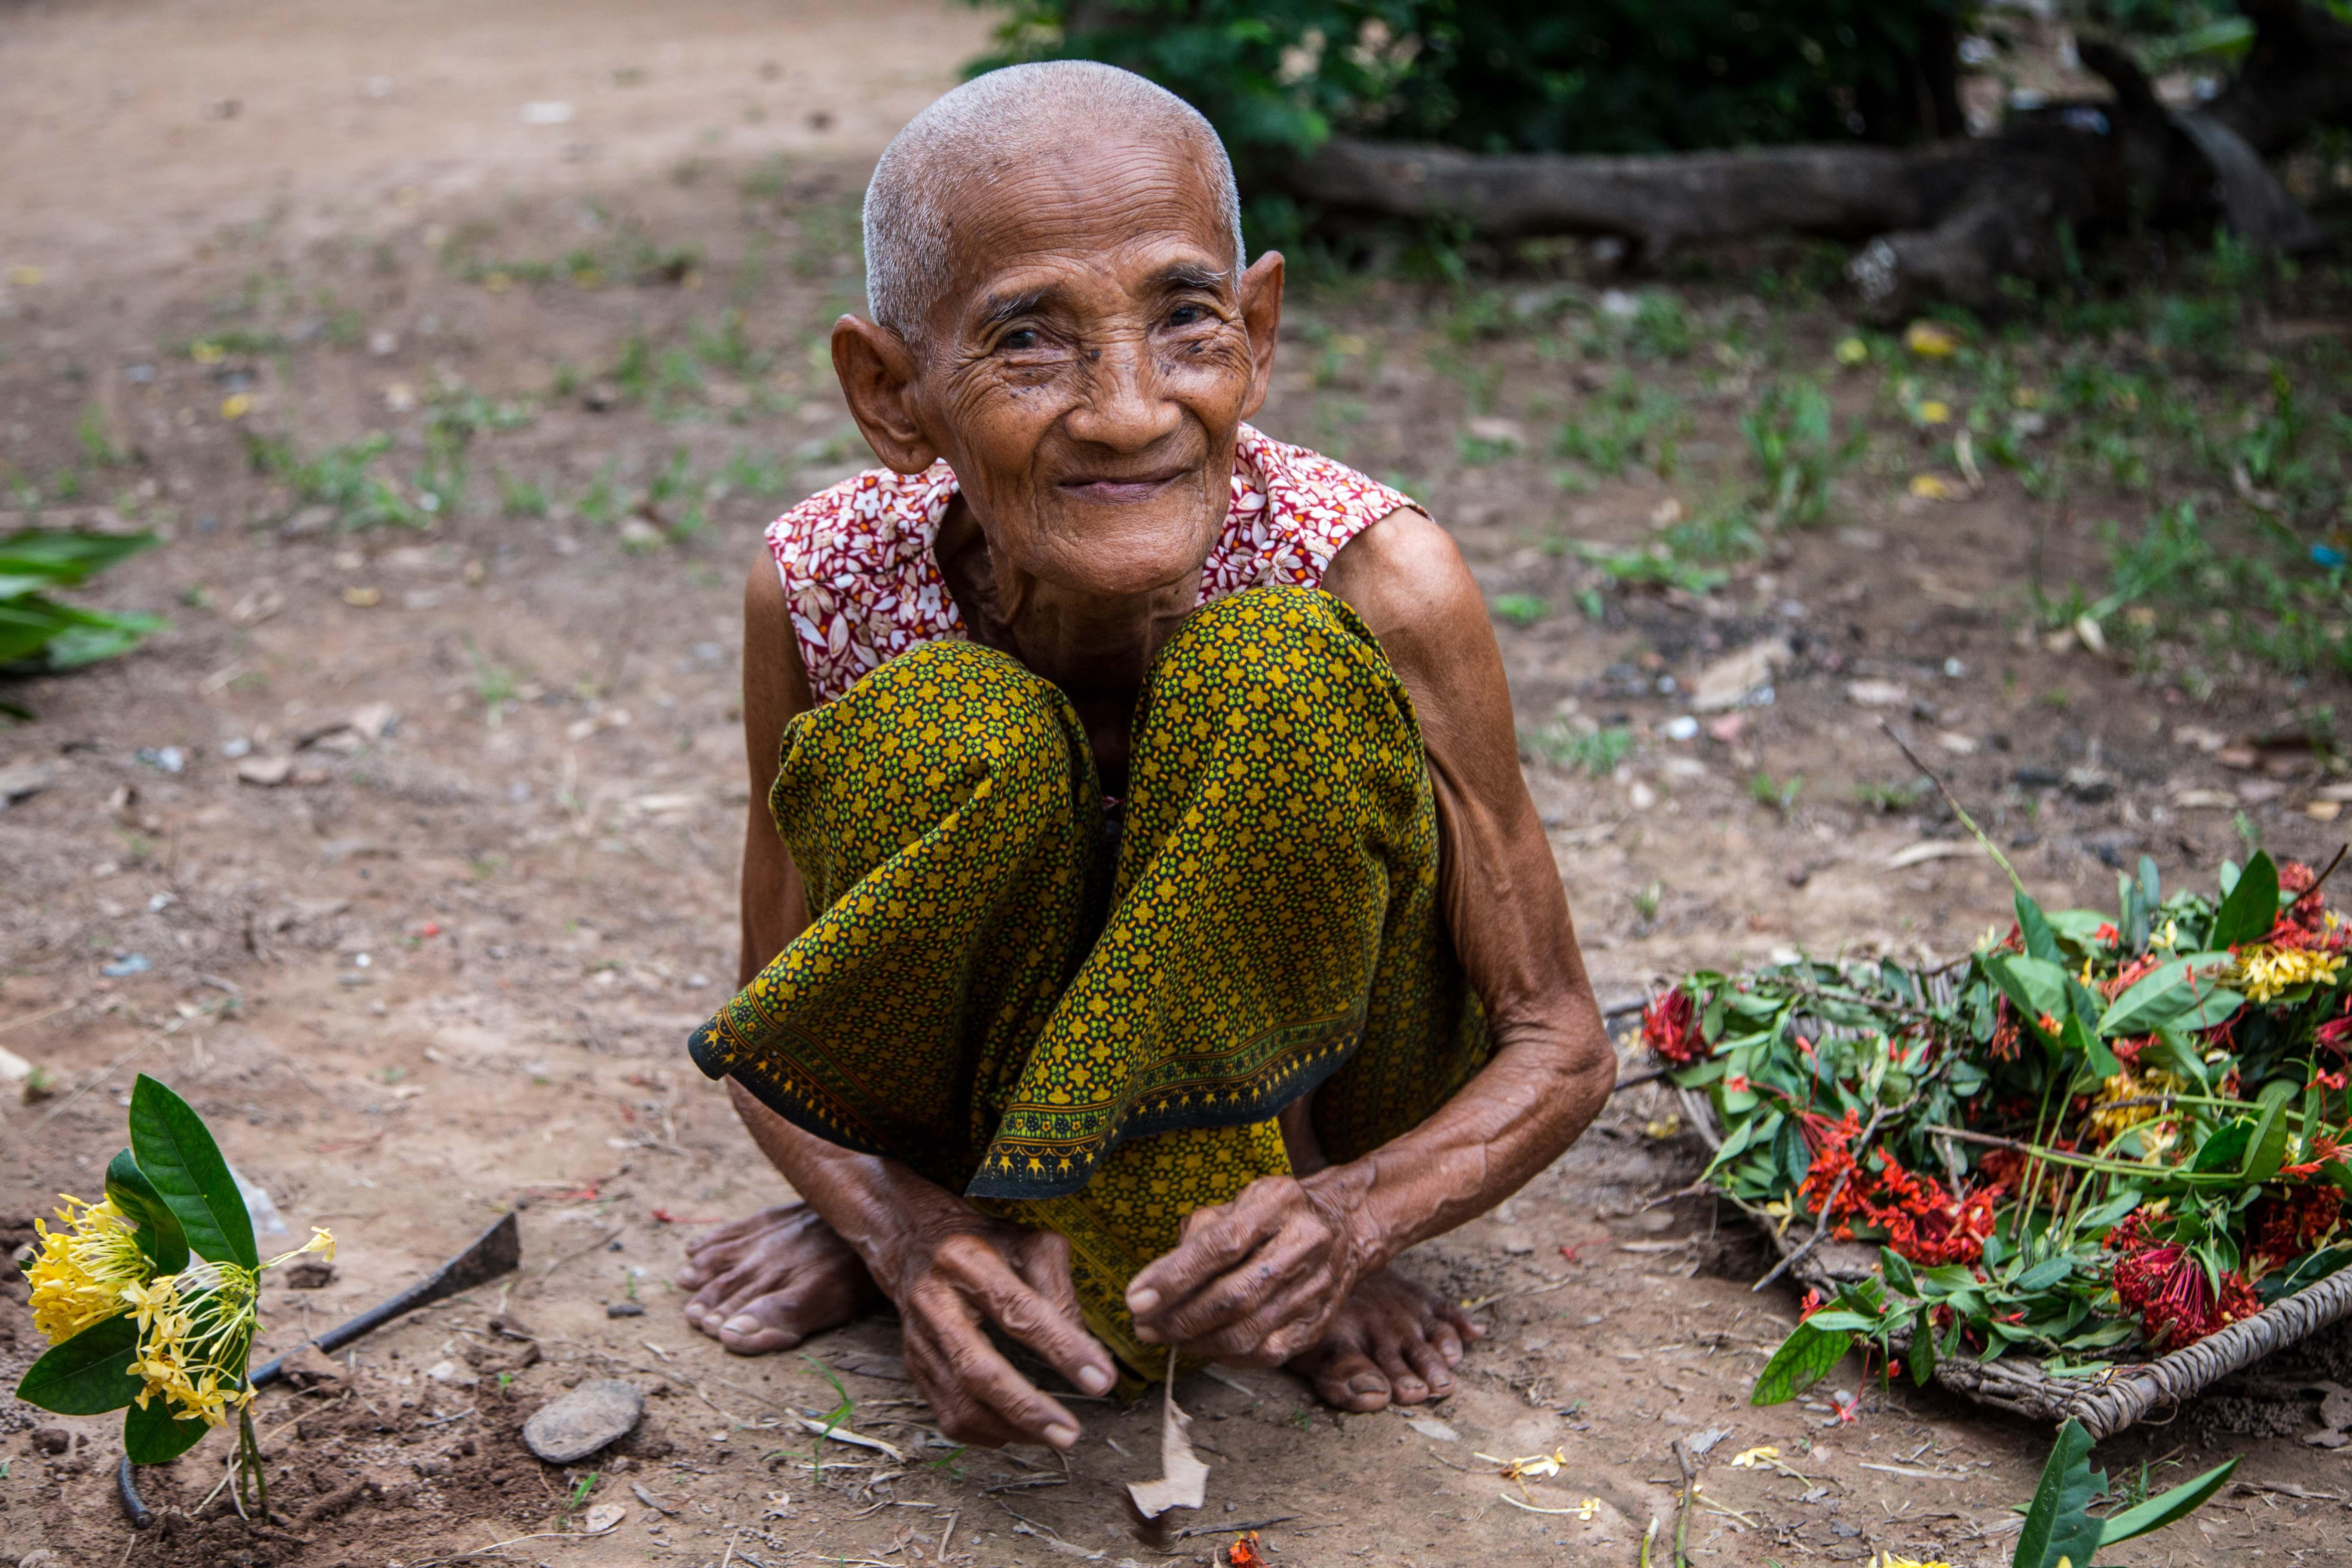 Cambodia - Holy and flowers di chiarabbate